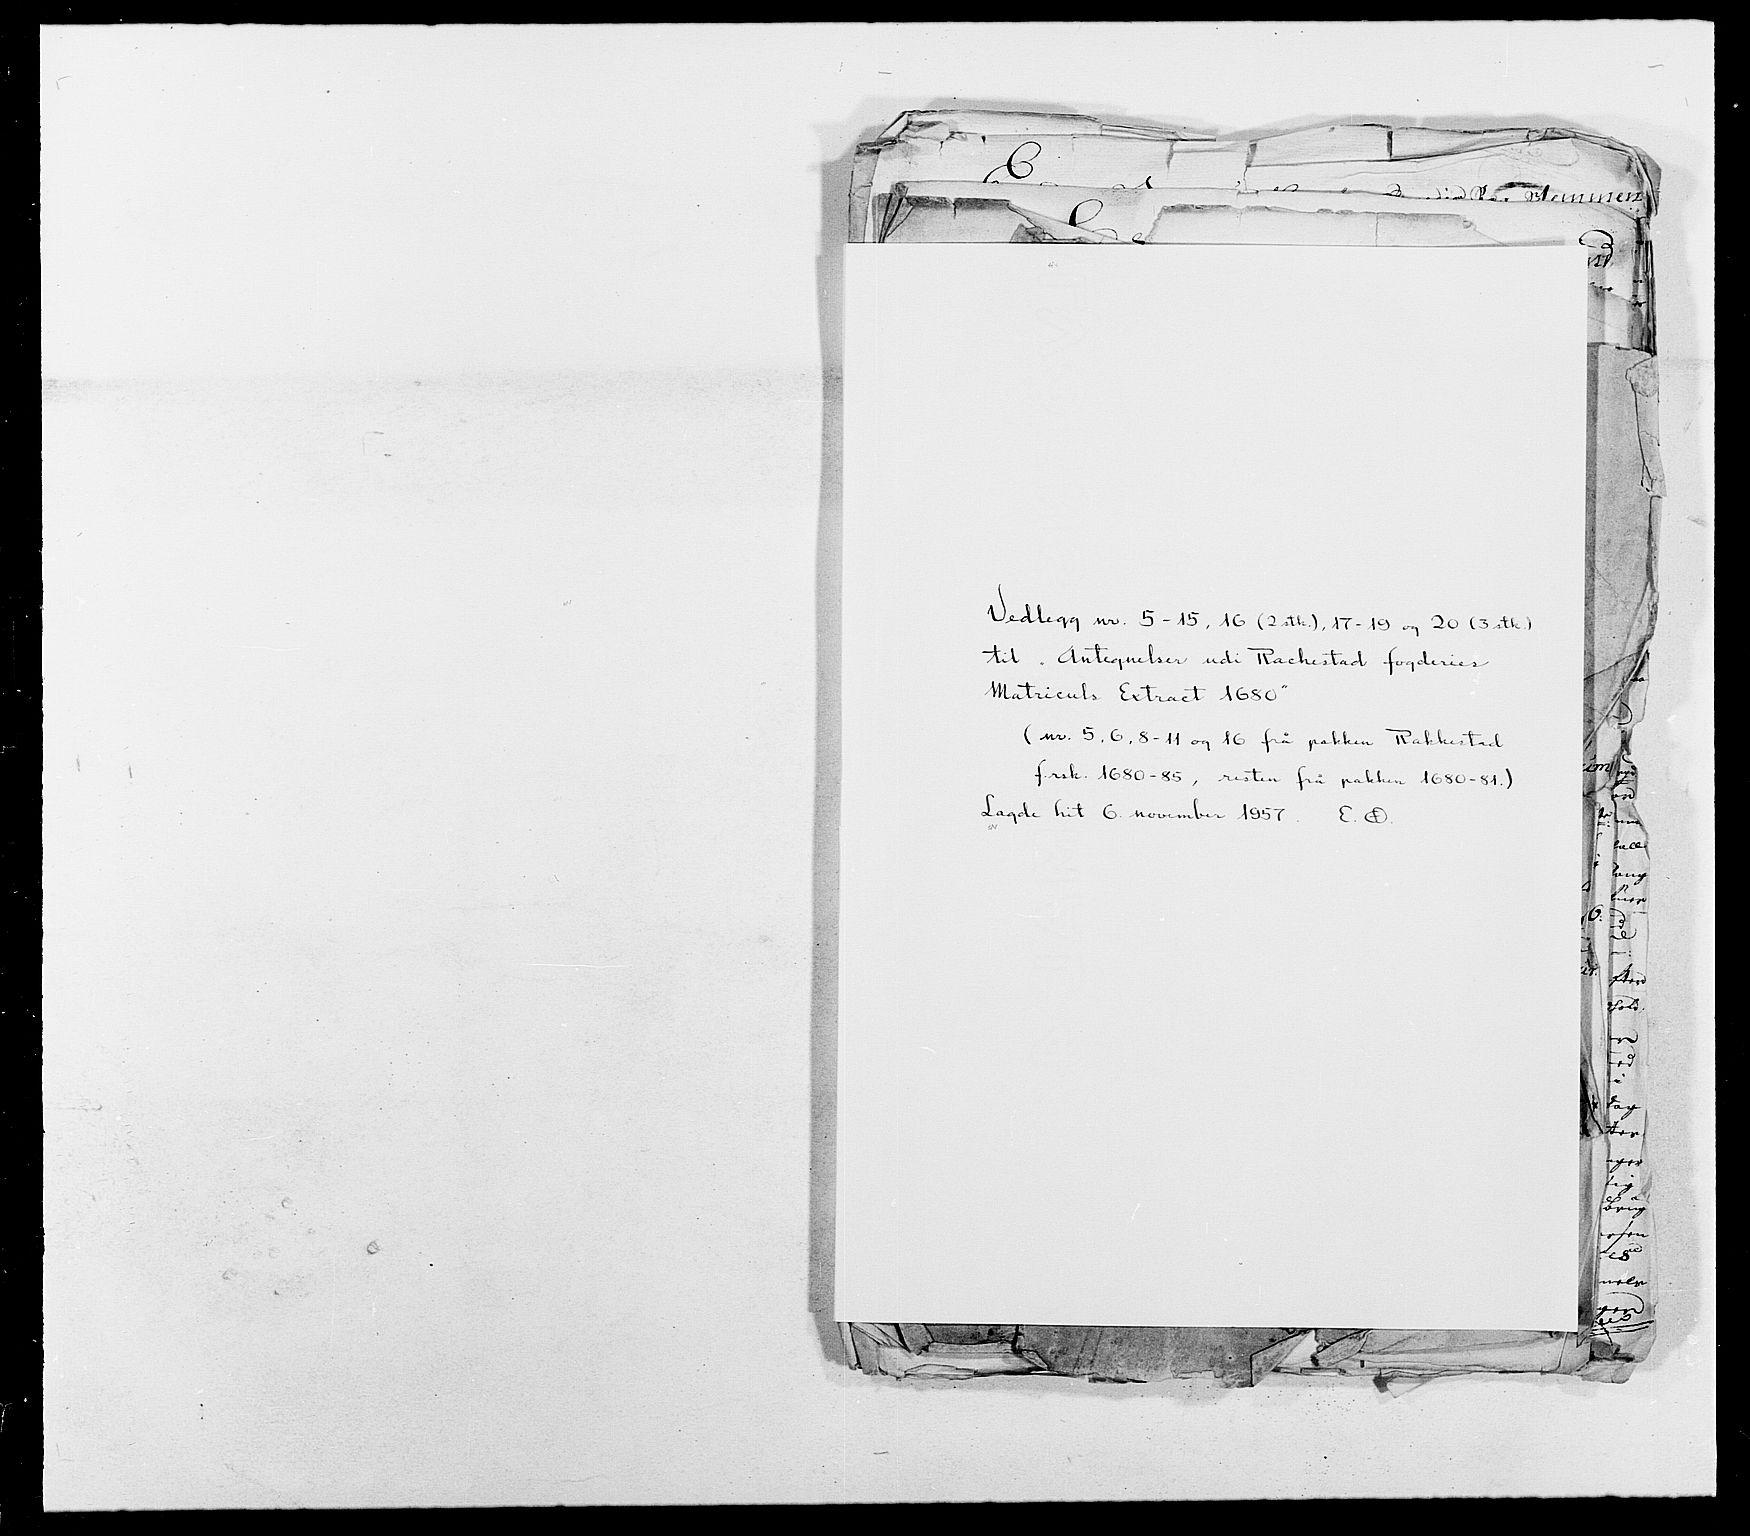 RA, Rentekammeret inntil 1814, Reviderte regnskaper, Fogderegnskap, R05/L0276: Fogderegnskap Rakkestad, 1683-1688, s. 410